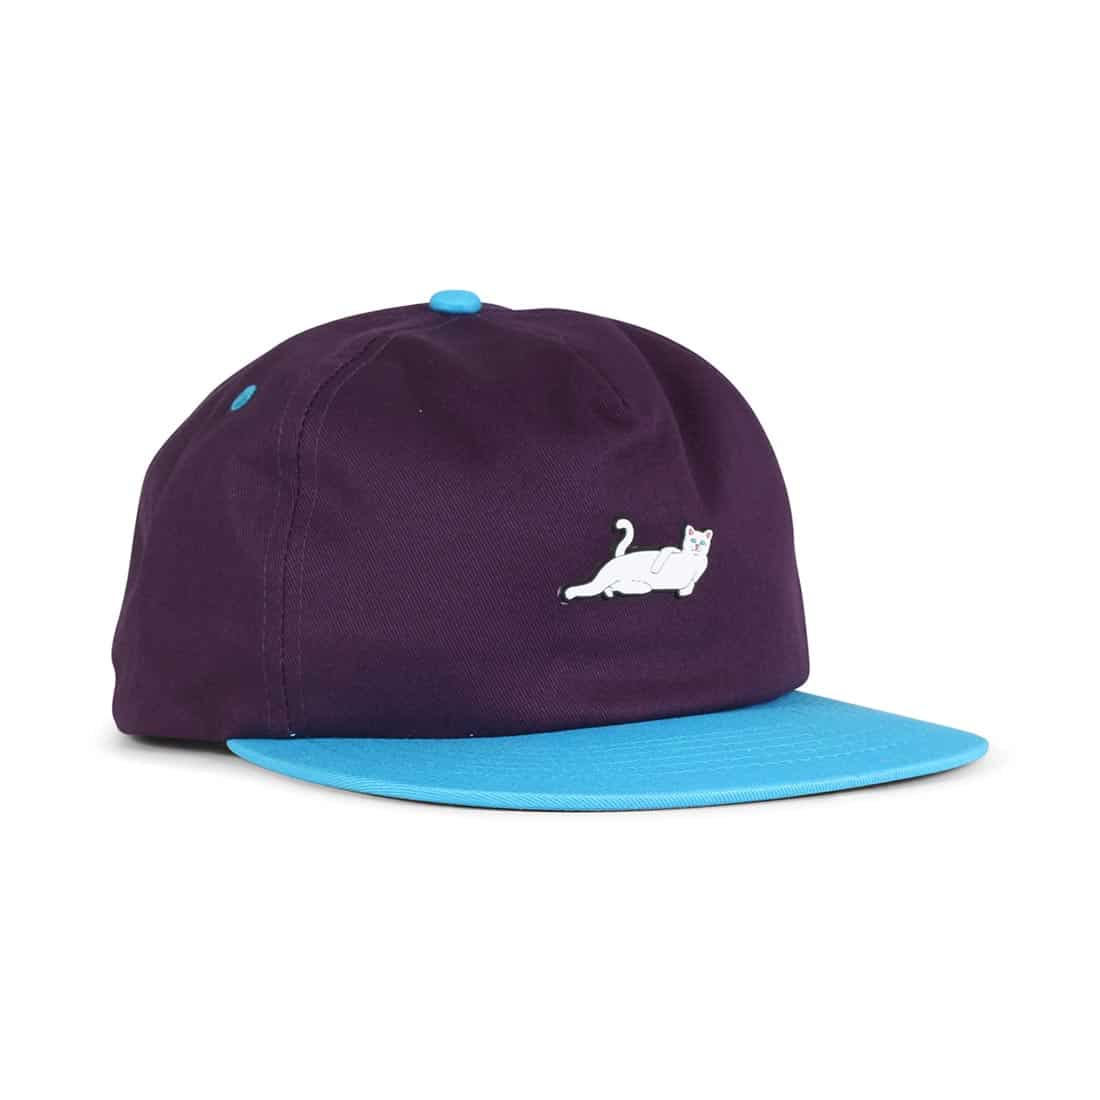 RIPNDIP Castanza 5 Panel Snapback Hat - Lavender / Blue